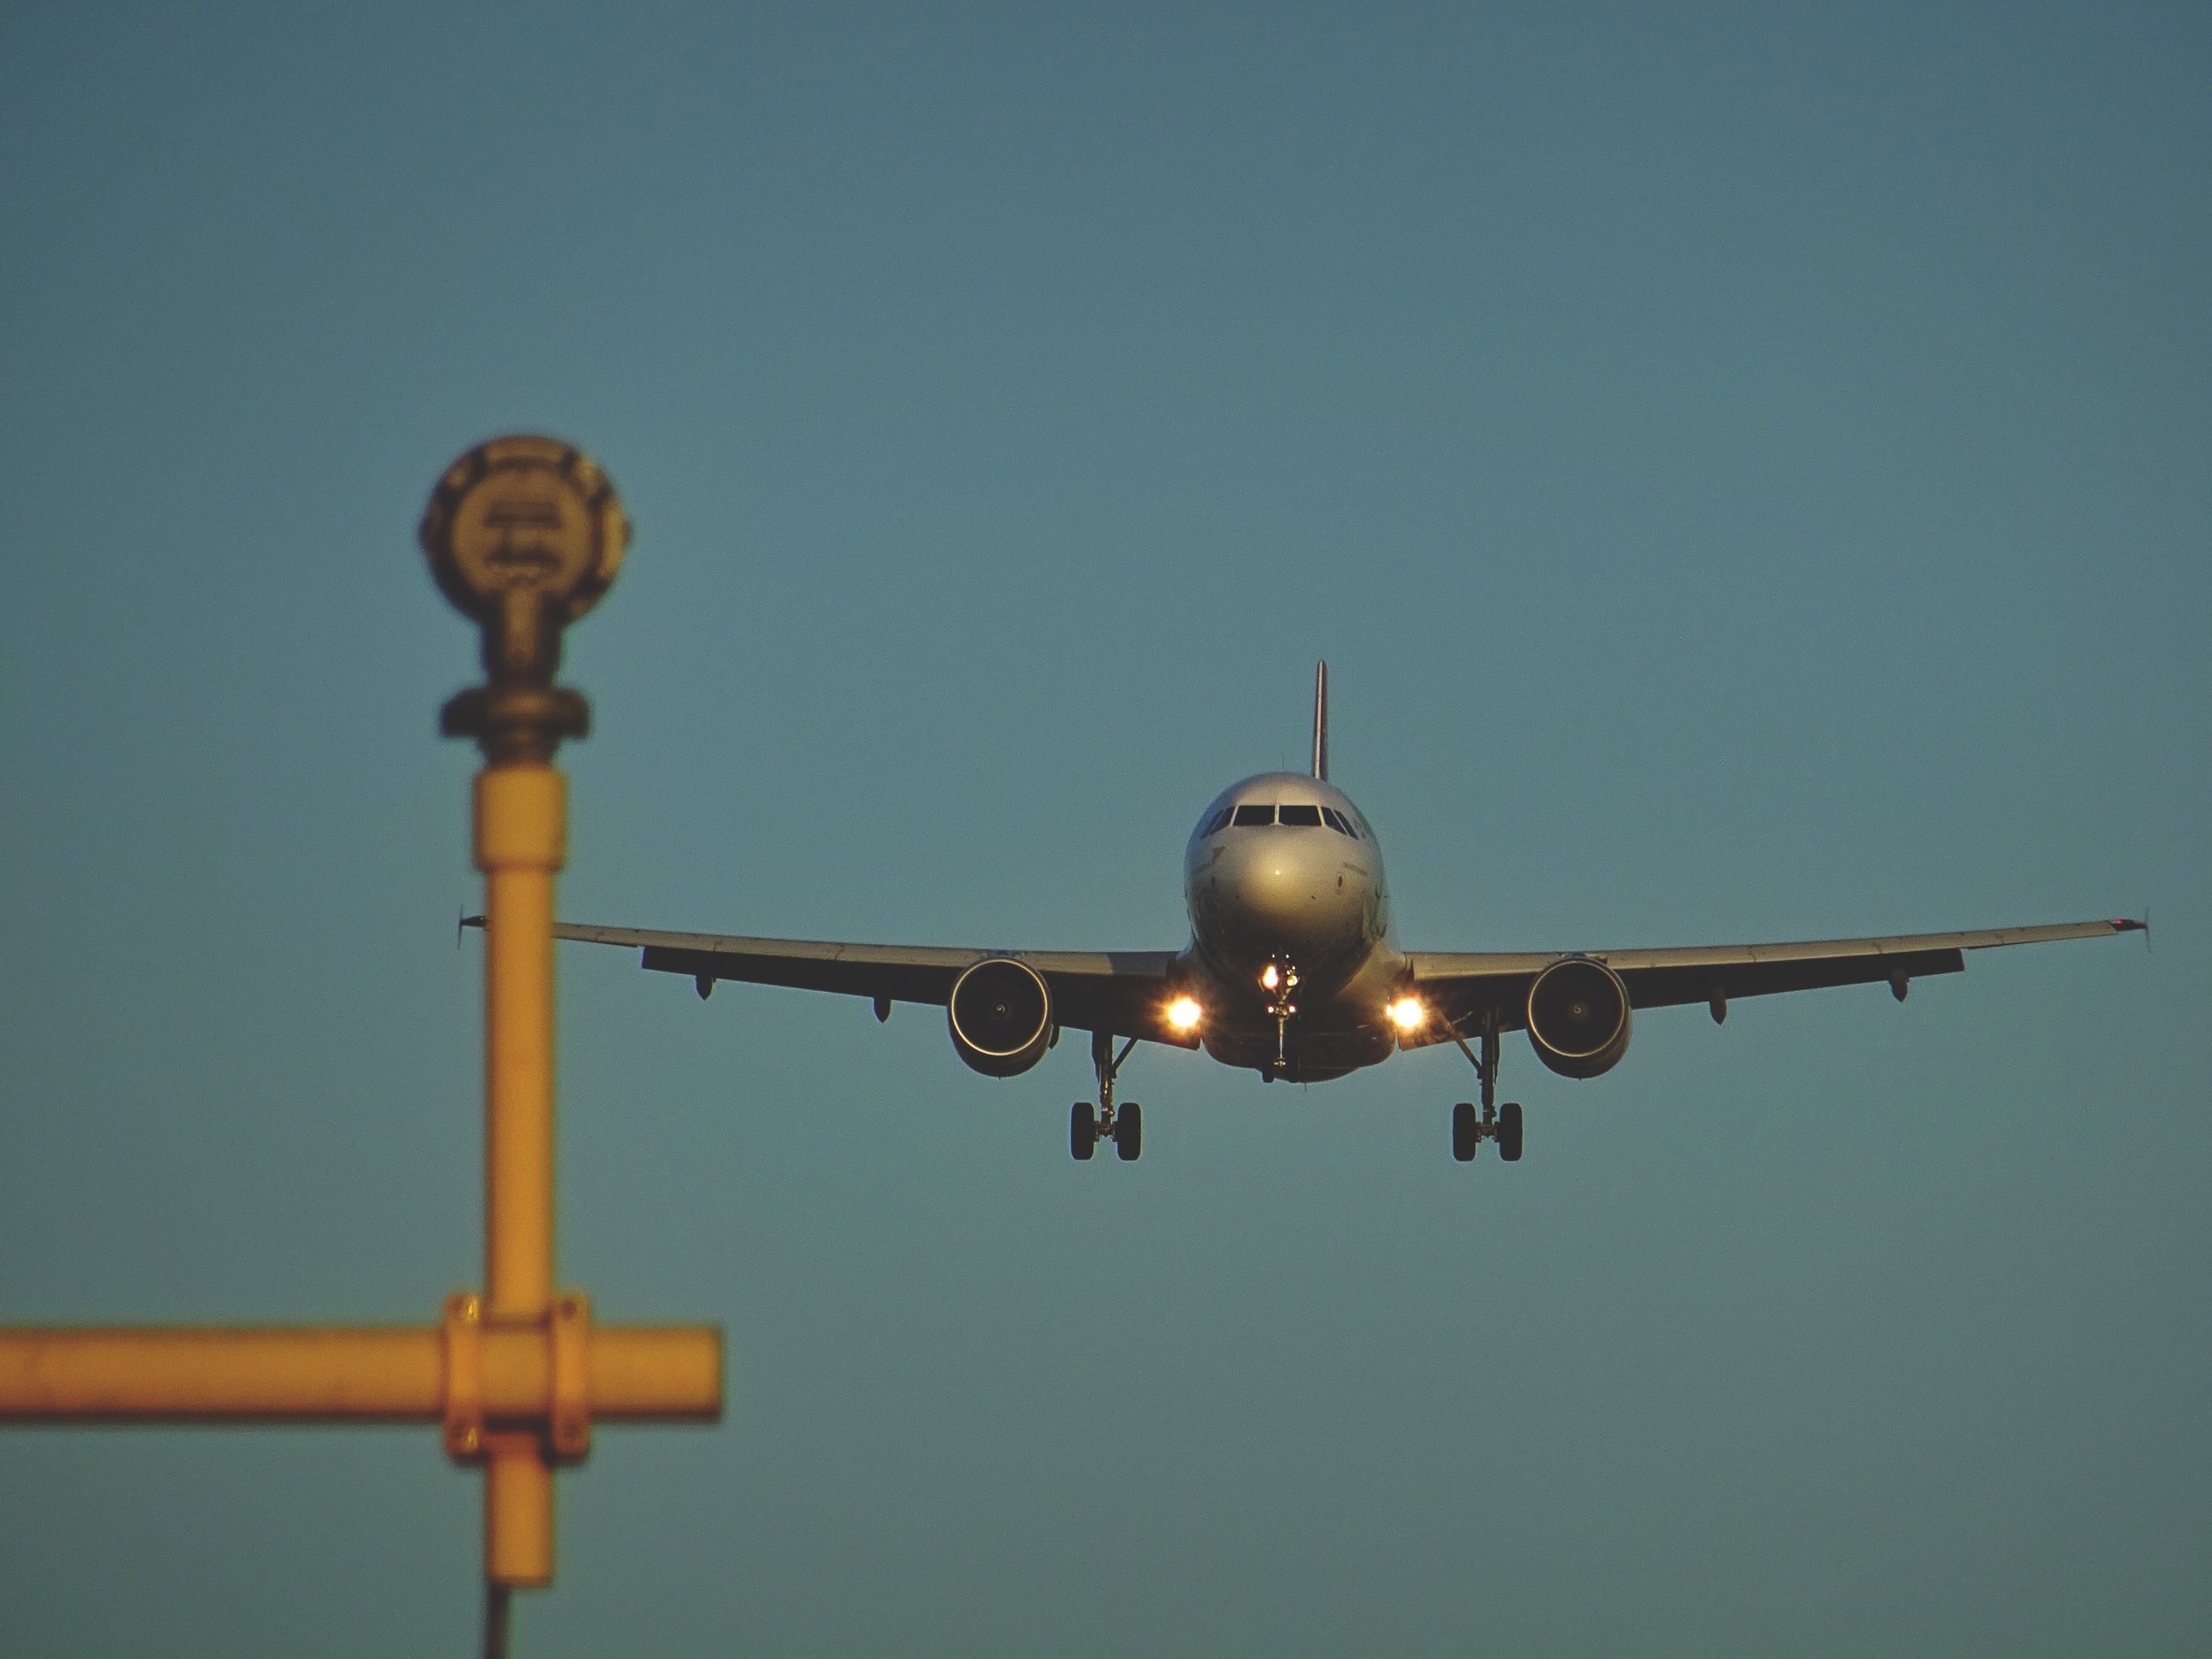 plane landing at heathrow aiport